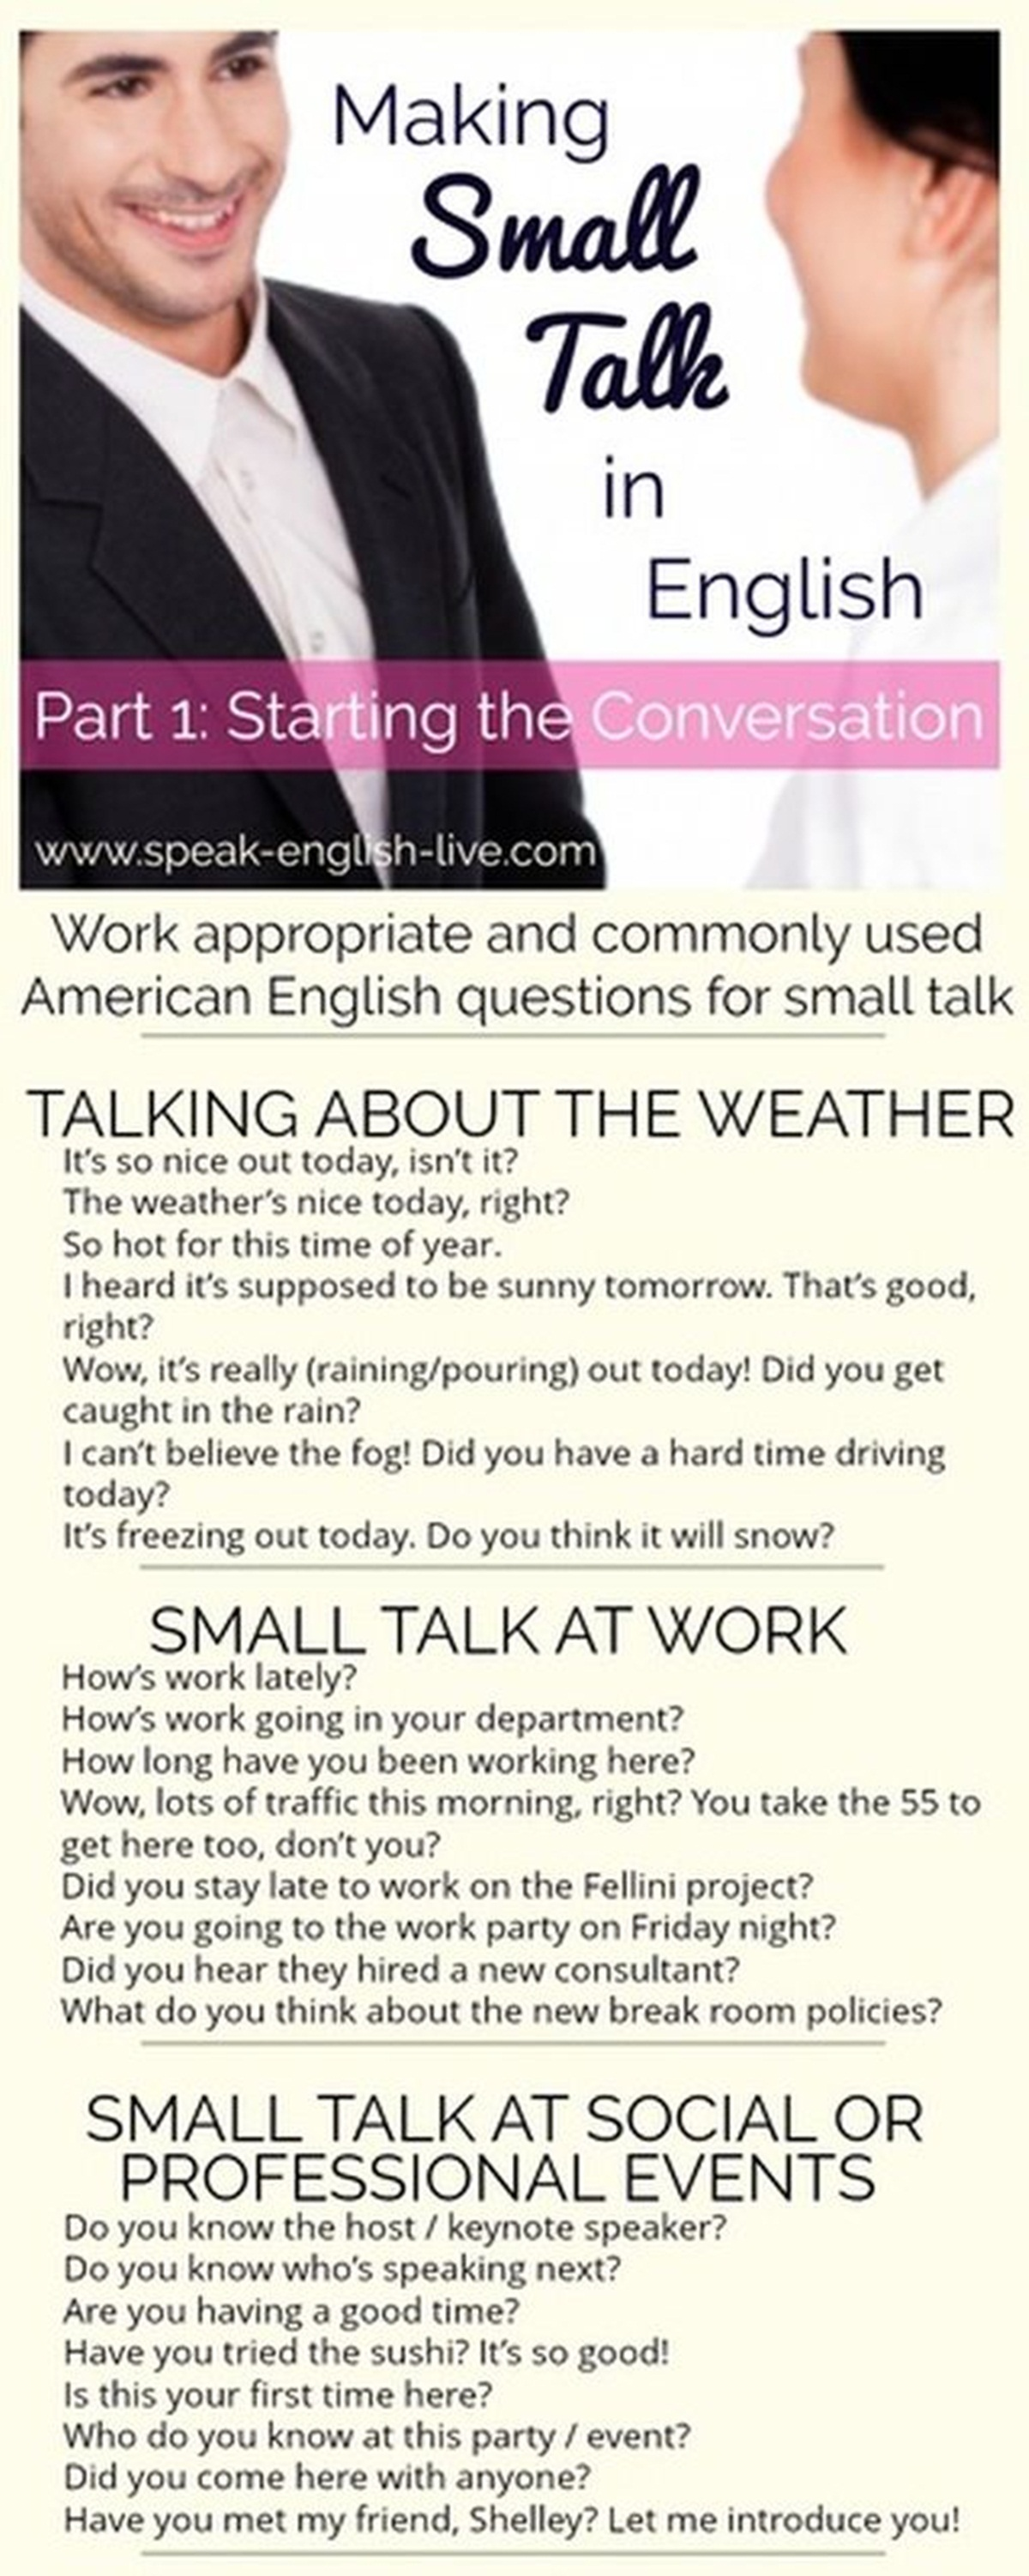 Making Small Talk in English 3